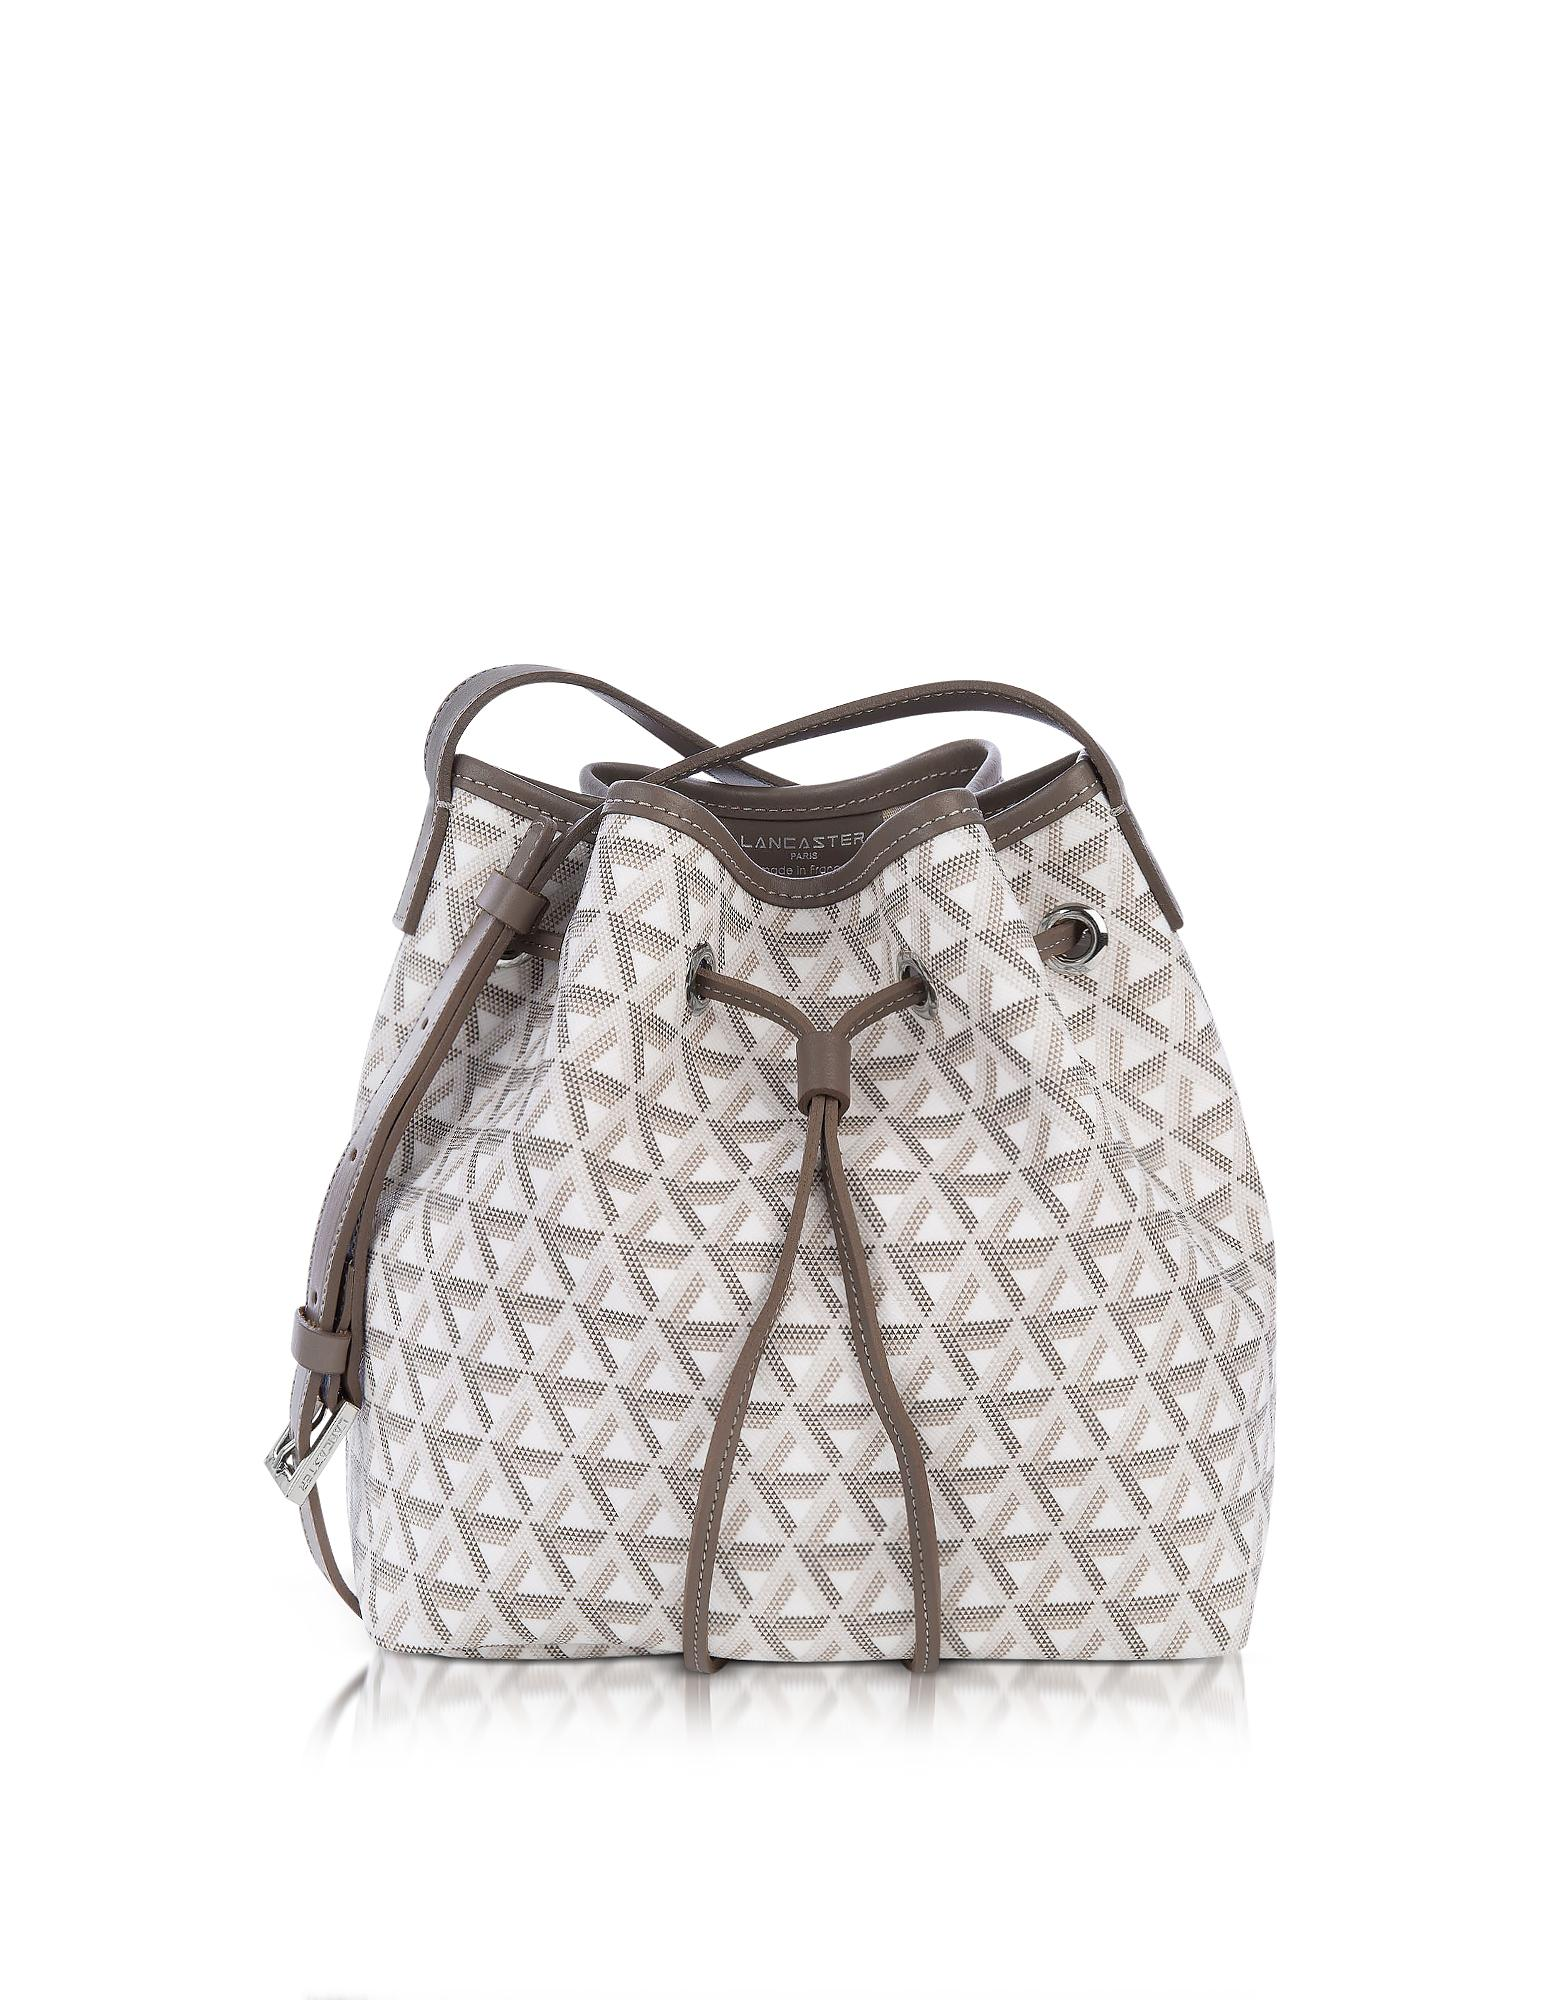 1cab4f81537b Lancaster Paris. Women s Ikon Small Coated Canvas Bucket Bag